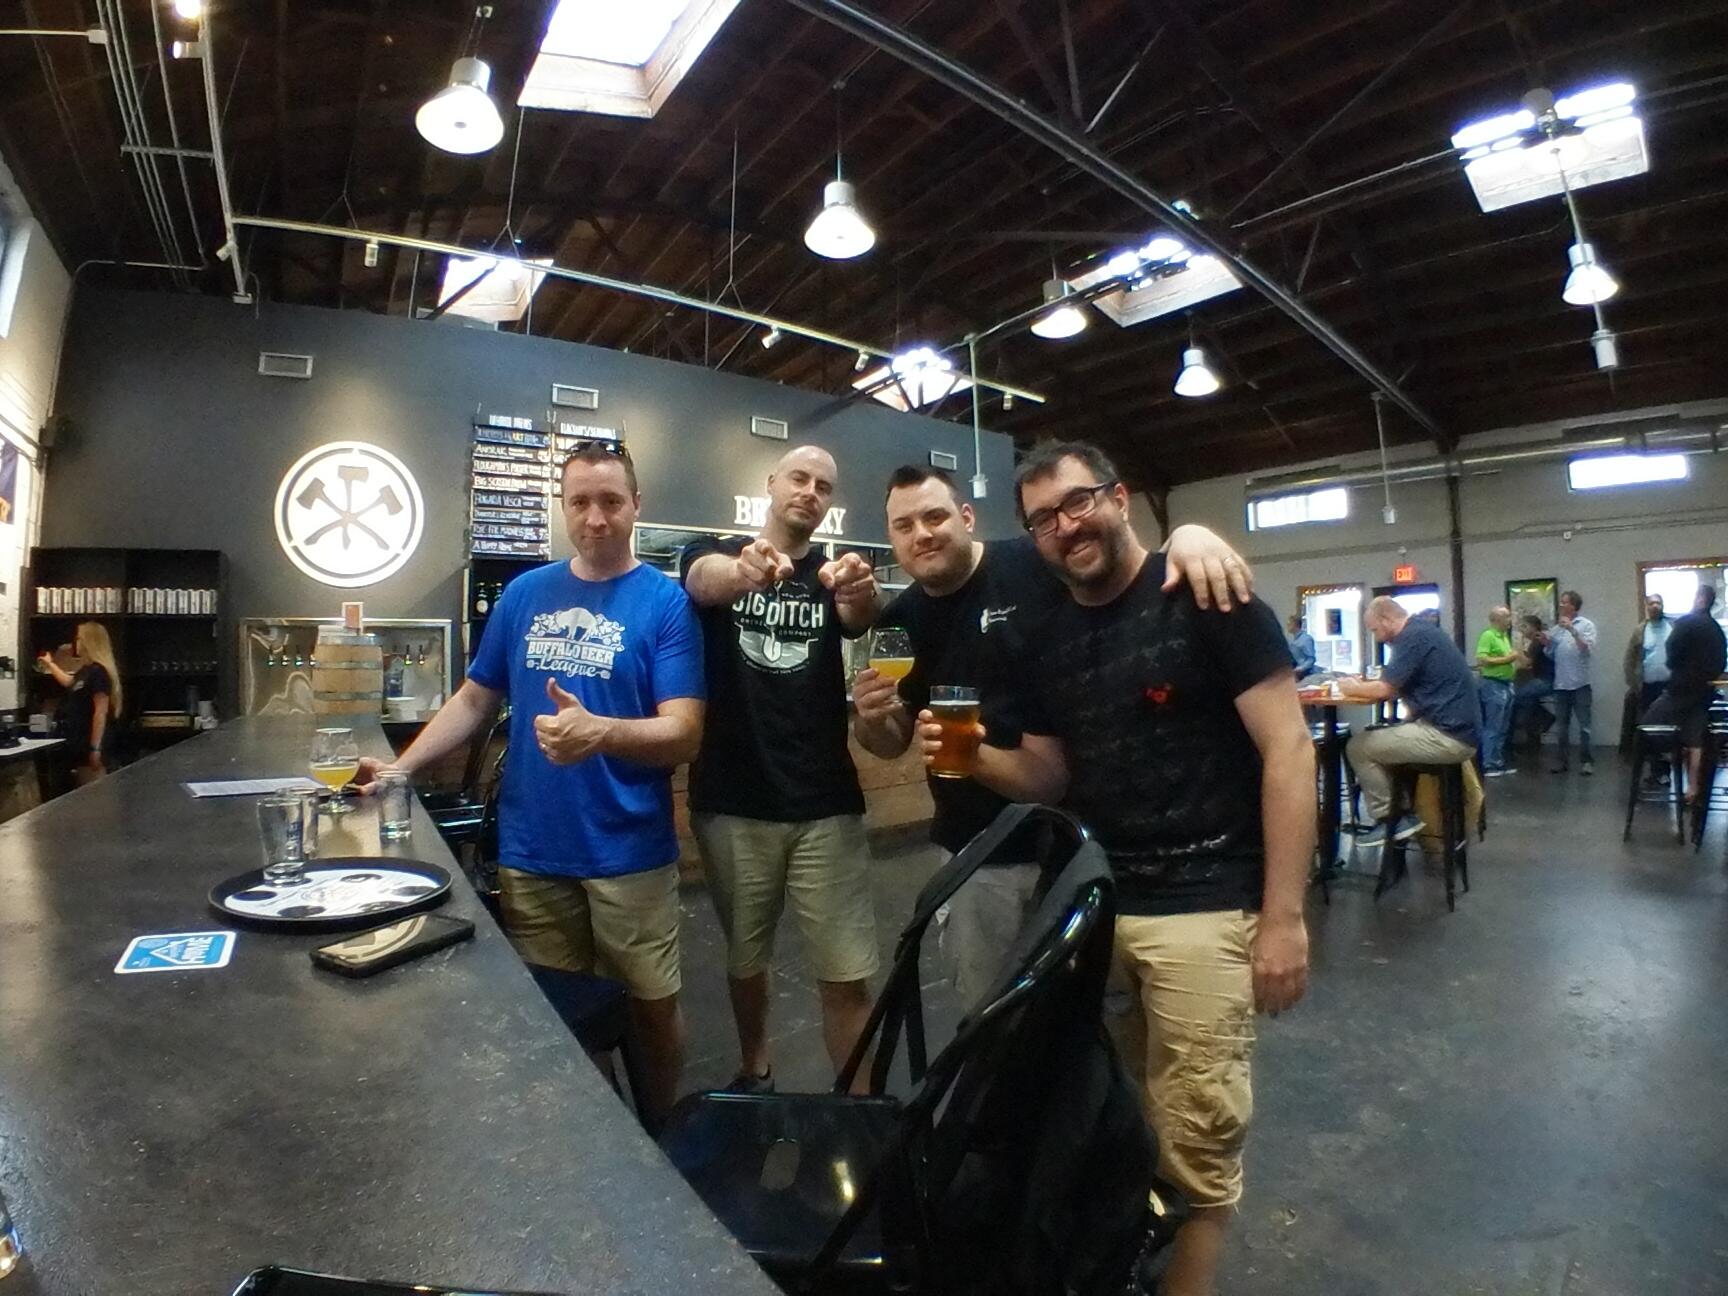 The Buffalo Beer League